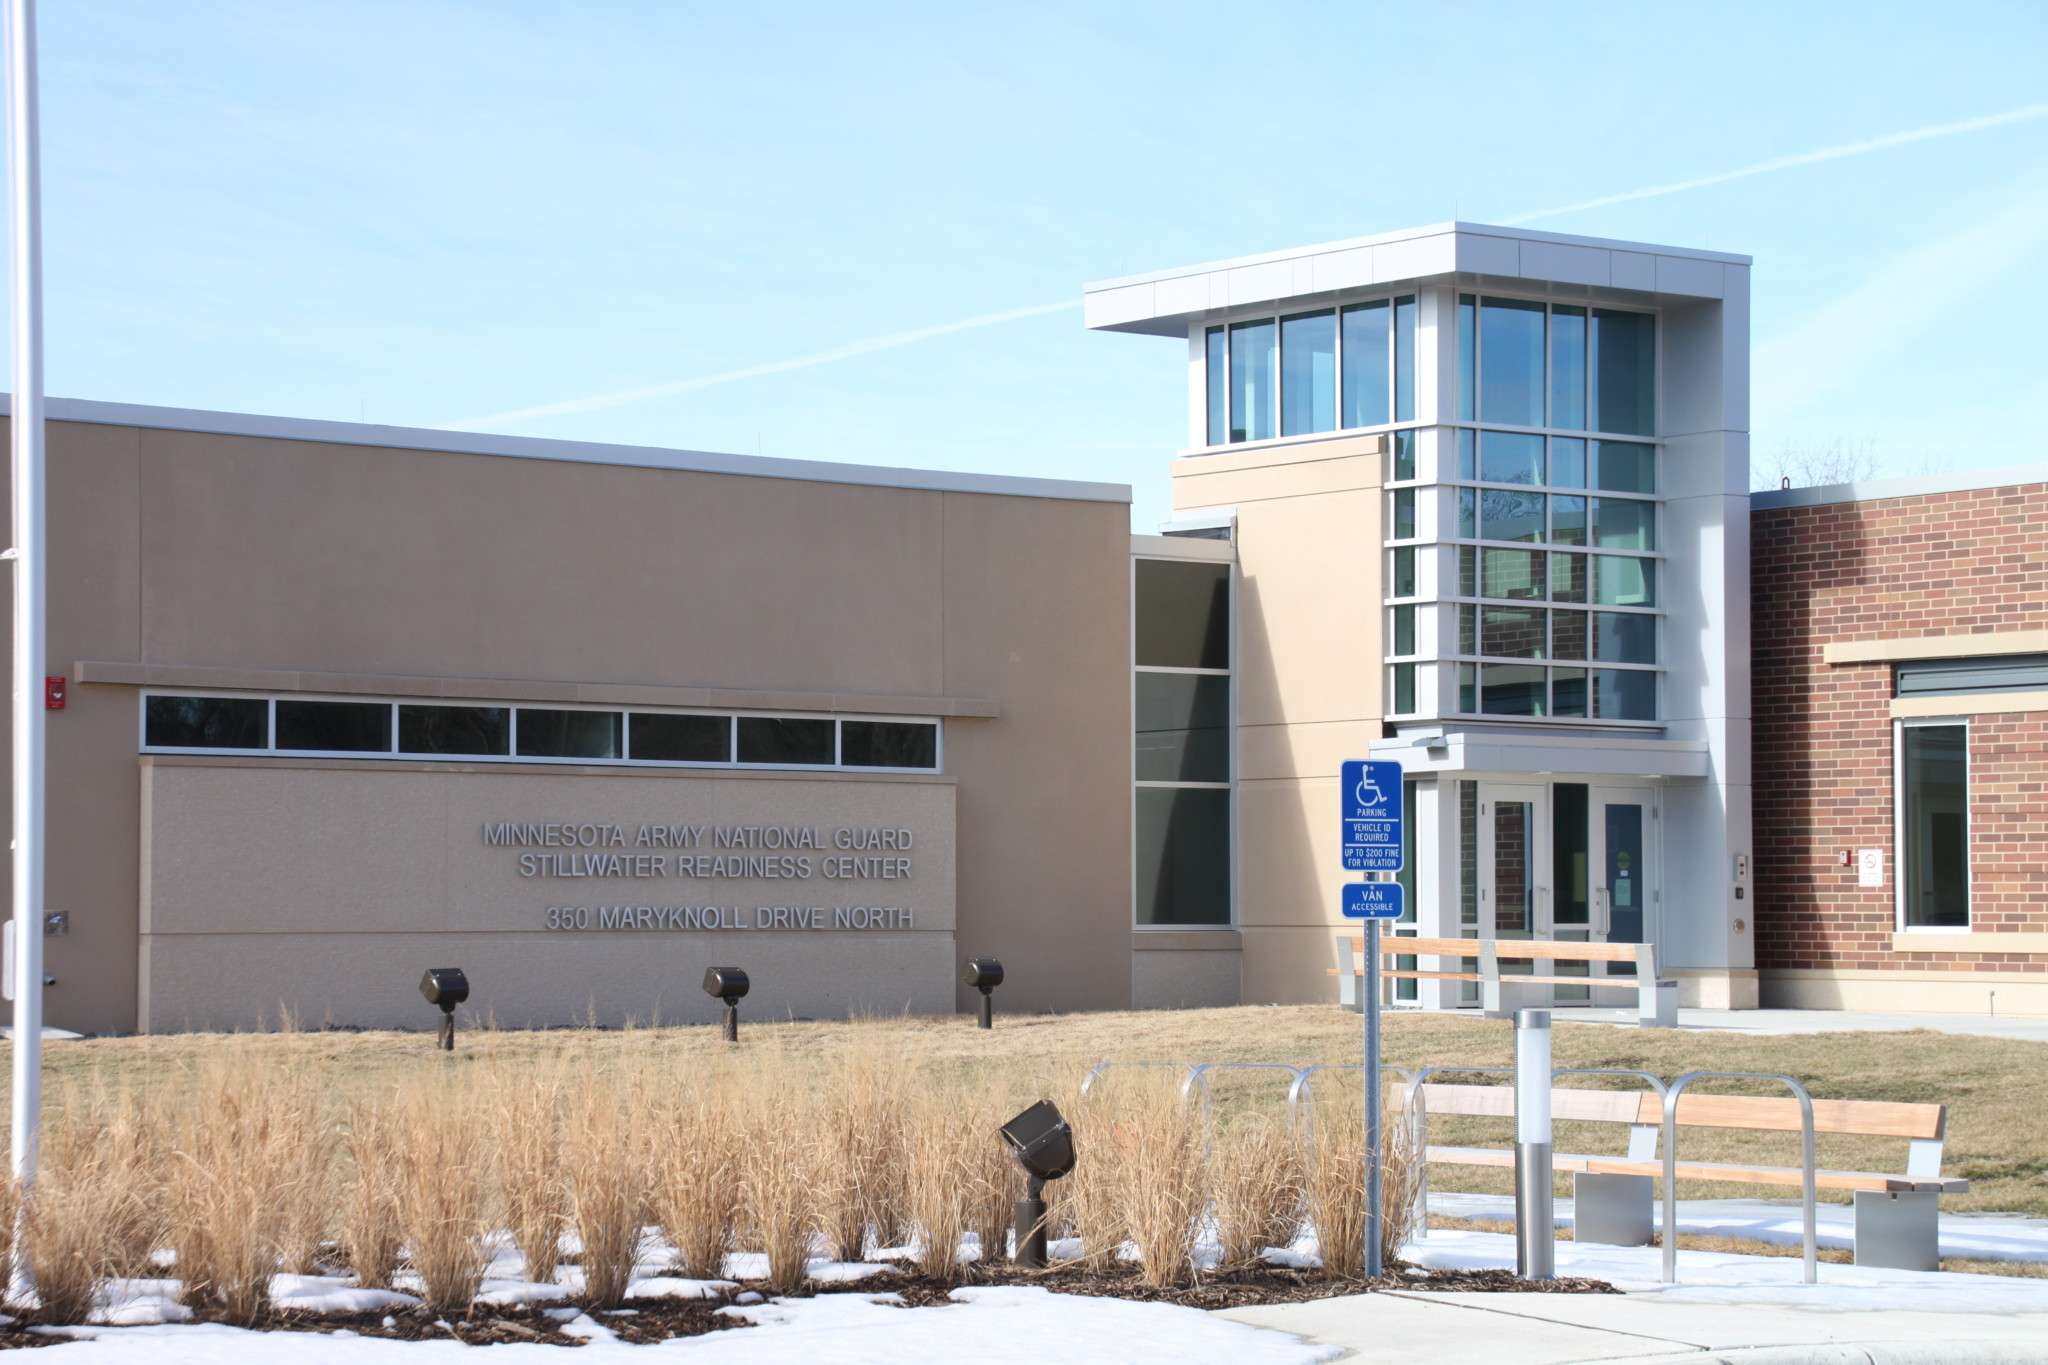 National Guard Readiness Center - Stillwater